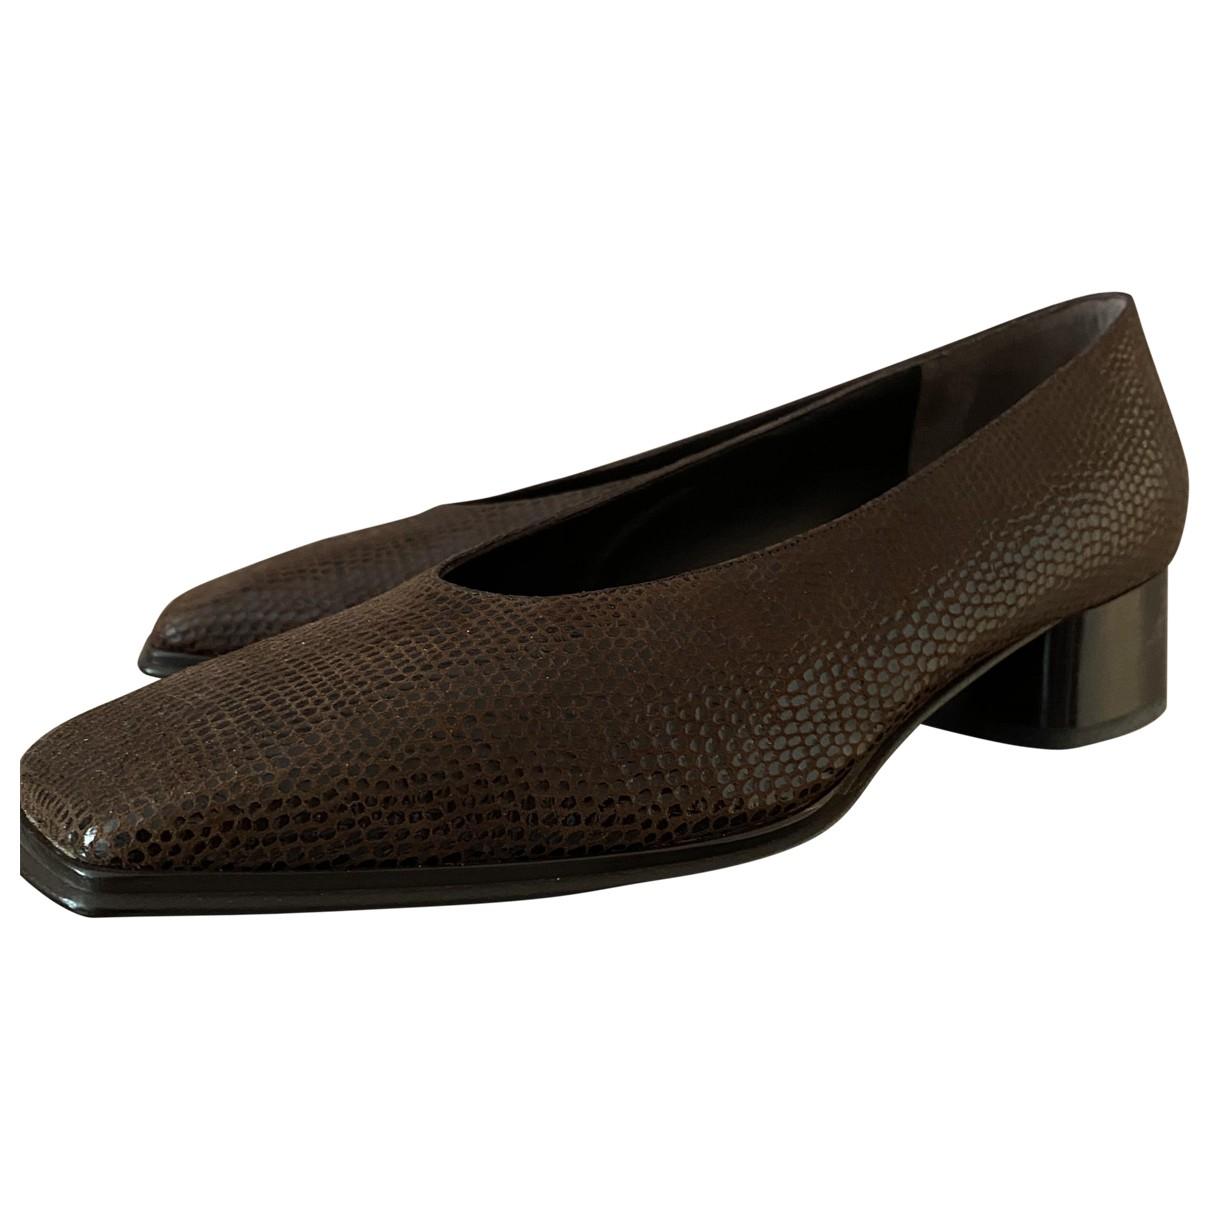 Rodo - Escarpins   pour femme en cuir - marron